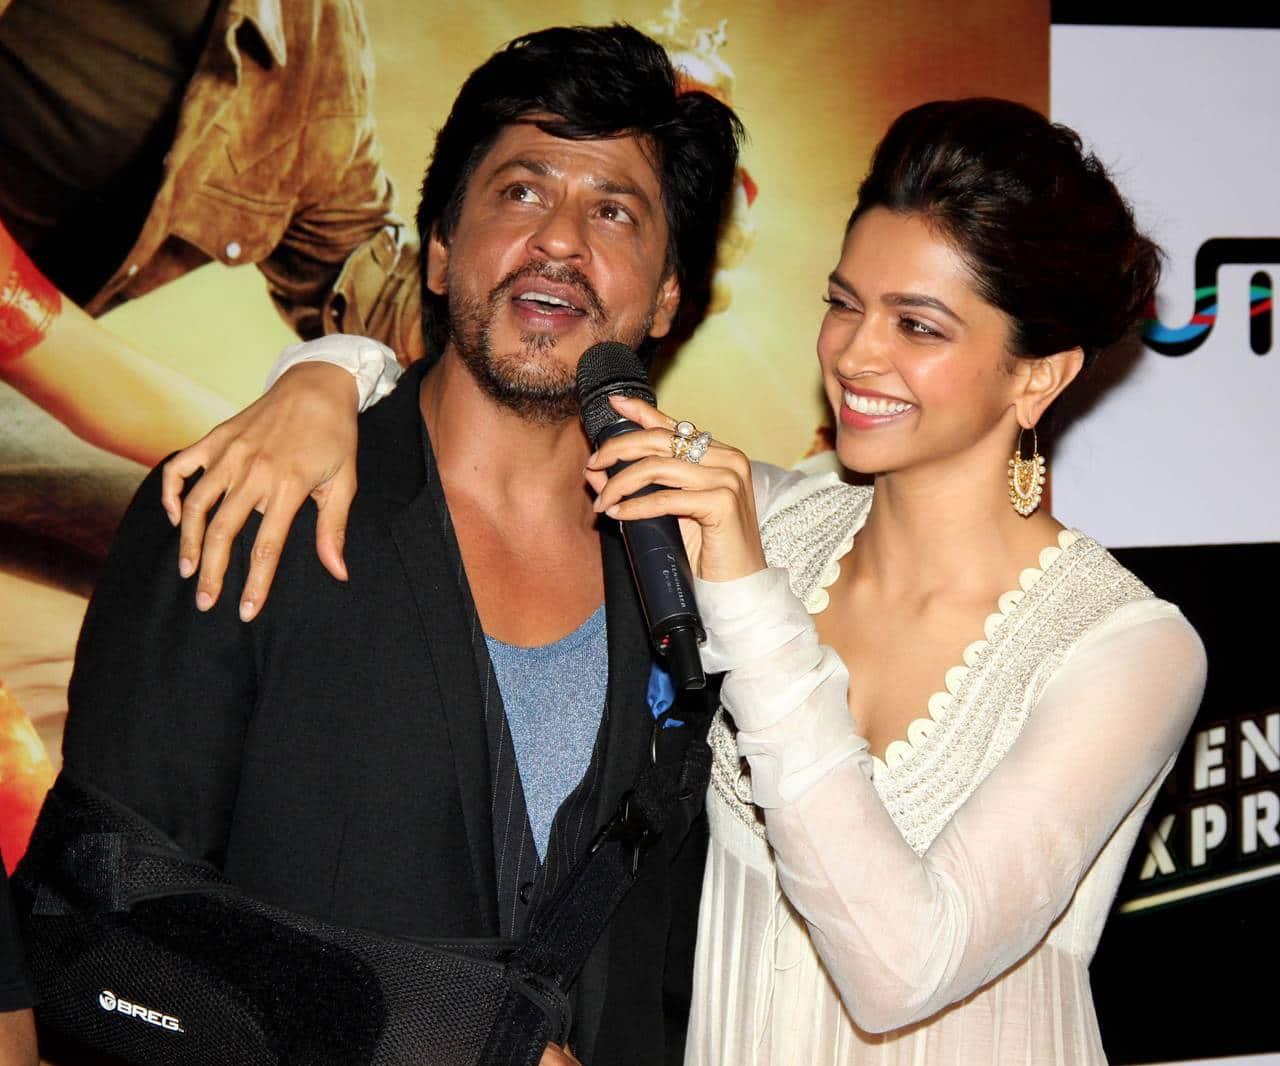 Zee Cine Awards 2014: Shah Rukh Khan, Deepika Padukone, Farhan Akhtar win big